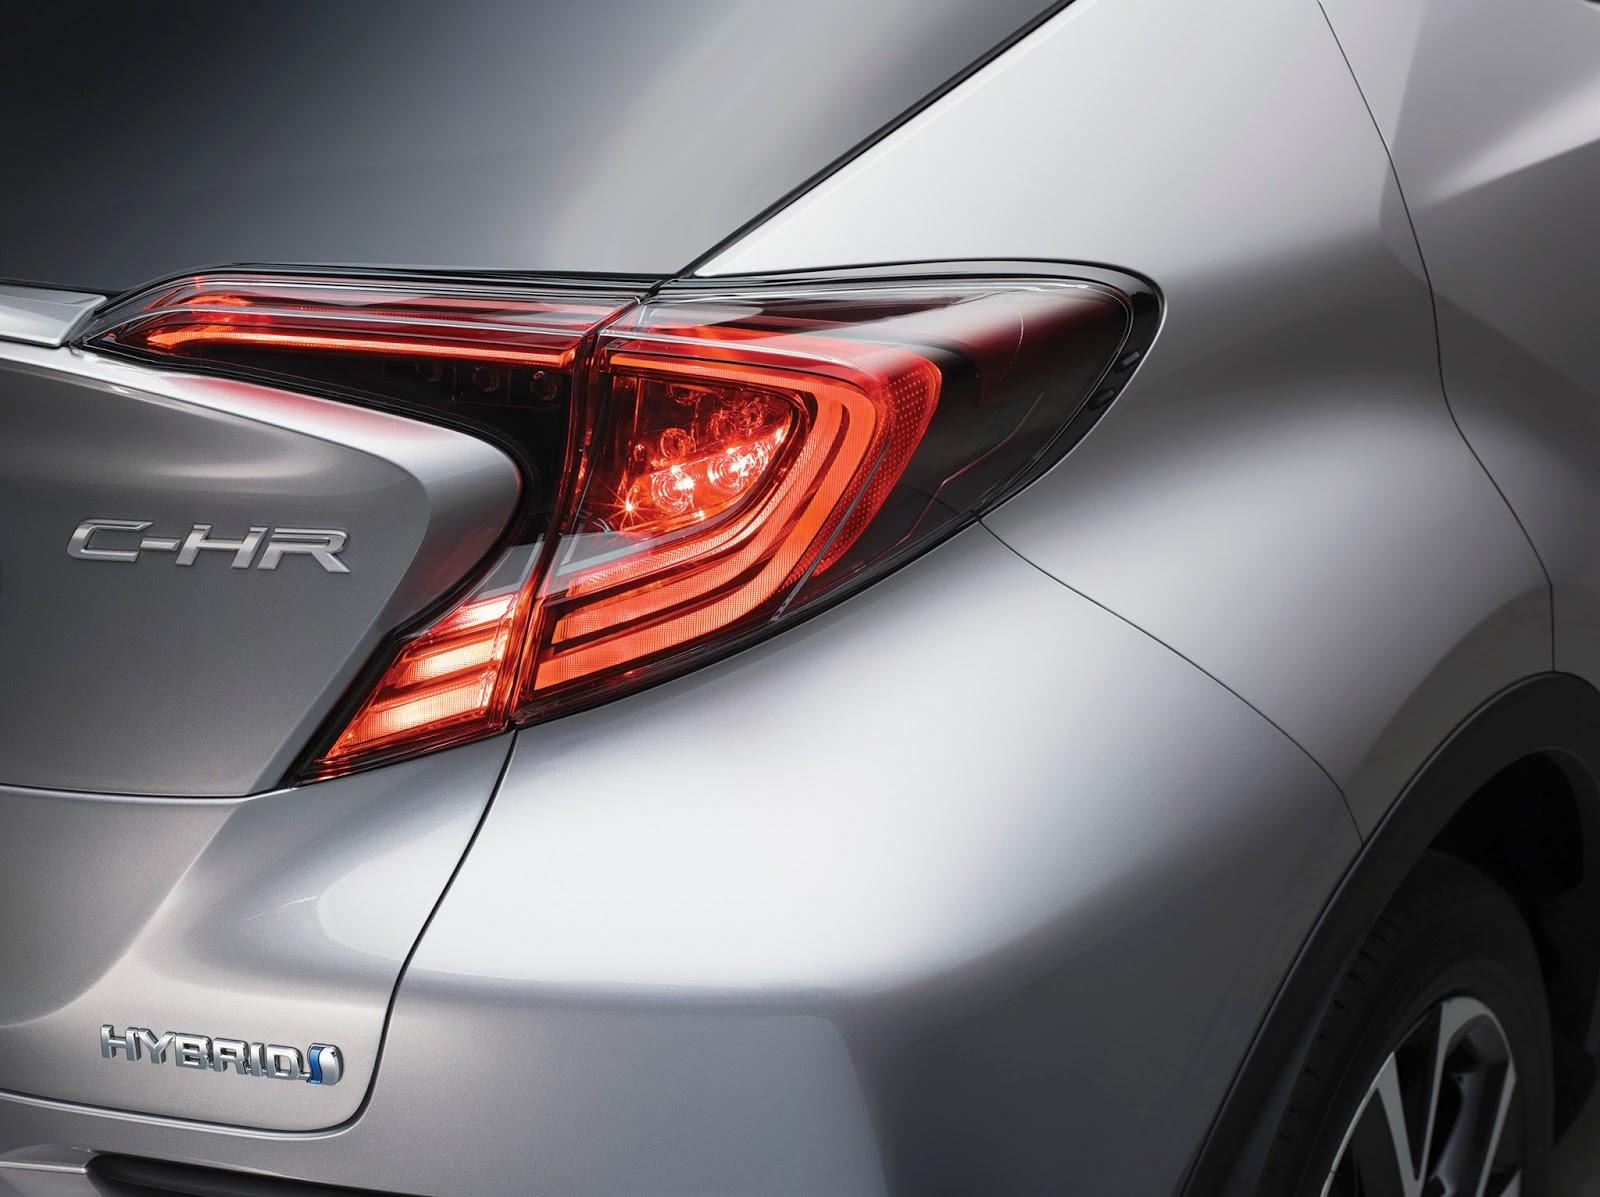 2017-Toyota-C-HR-05.jpg